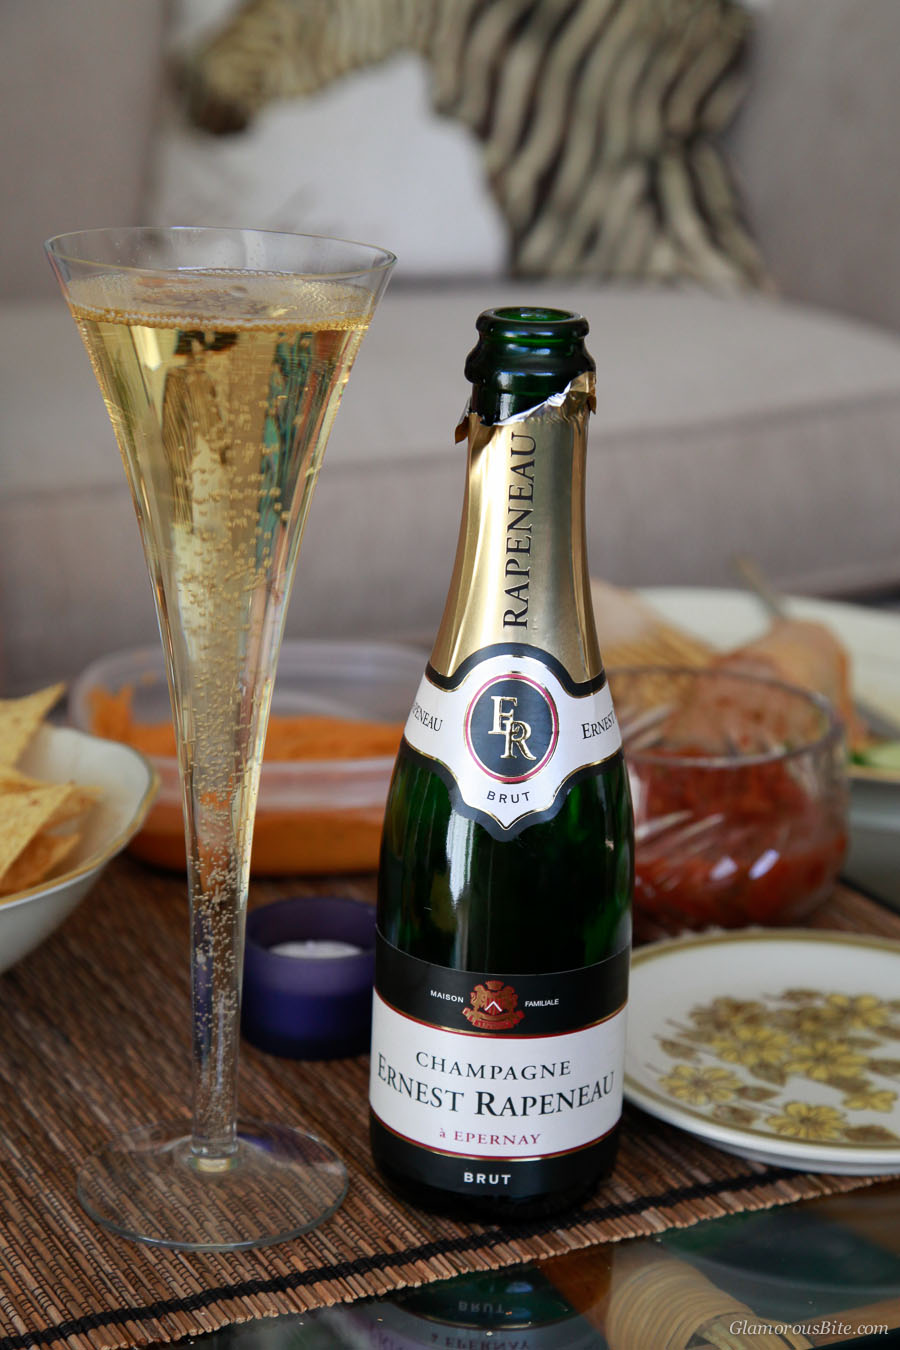 Champagne Ernest Rapeneau